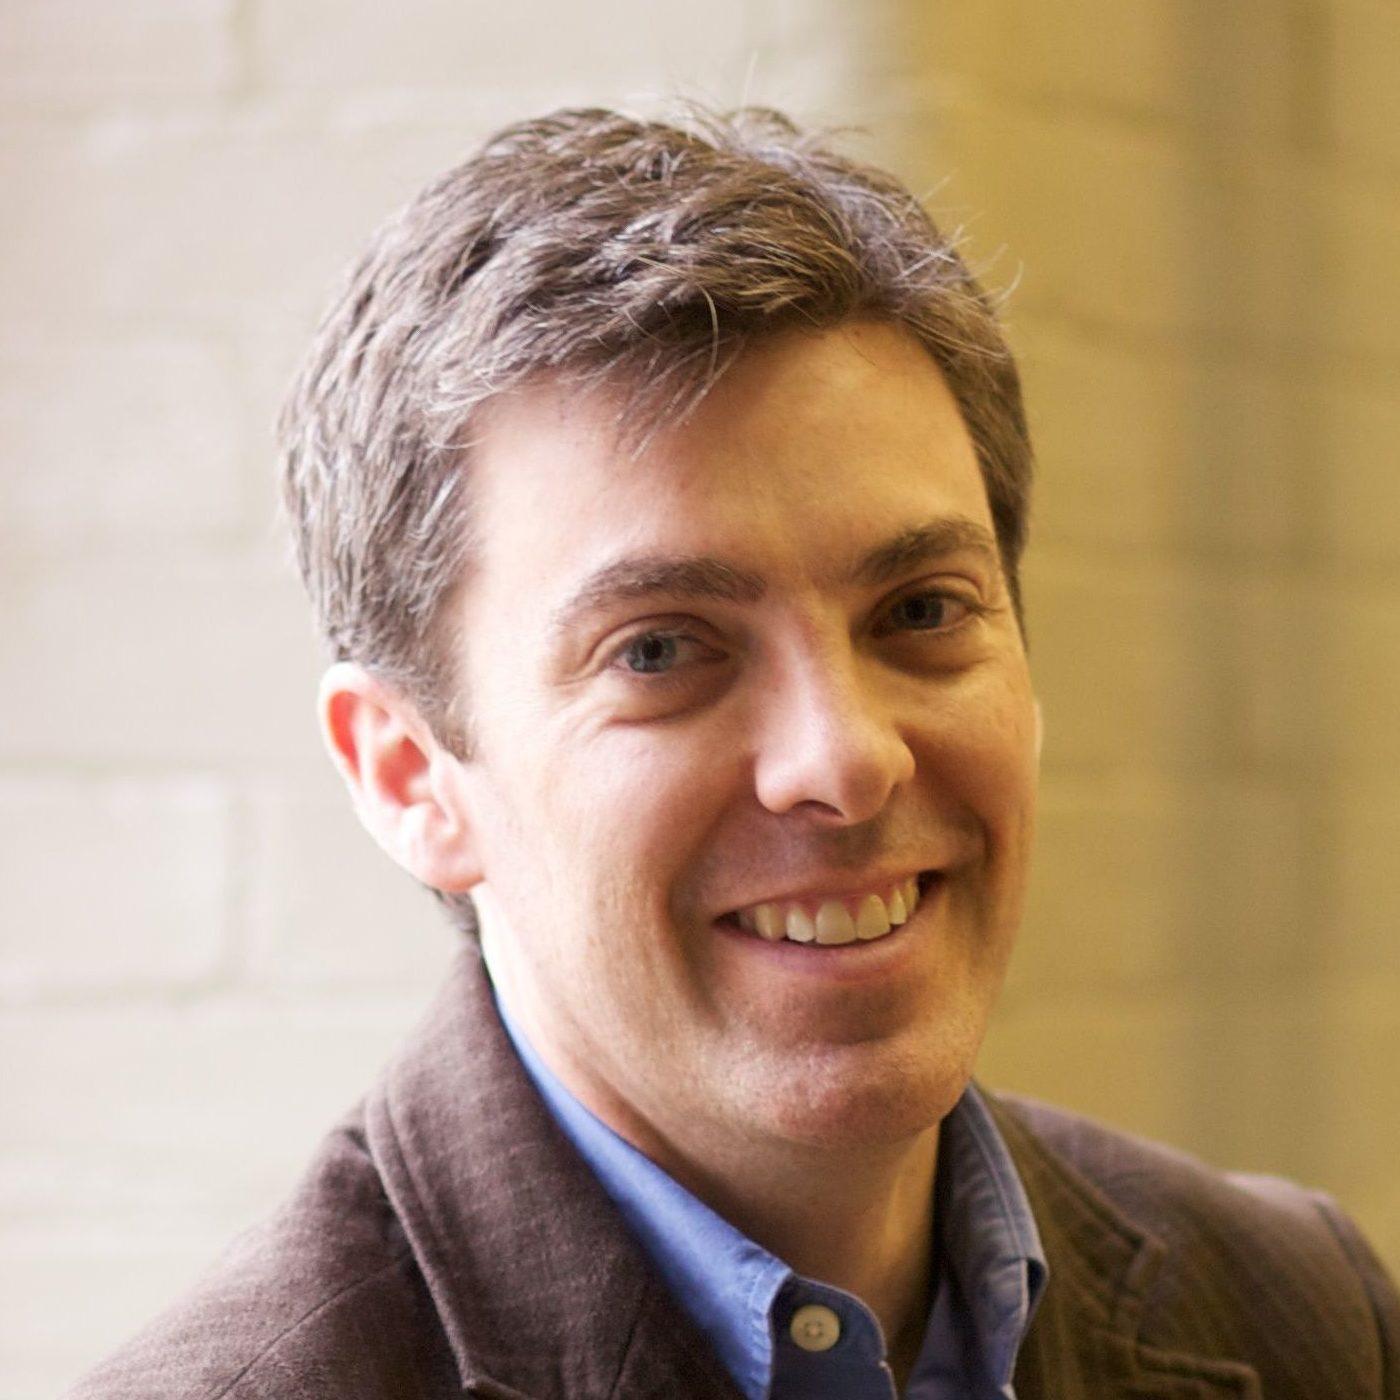 Joshua Marshall